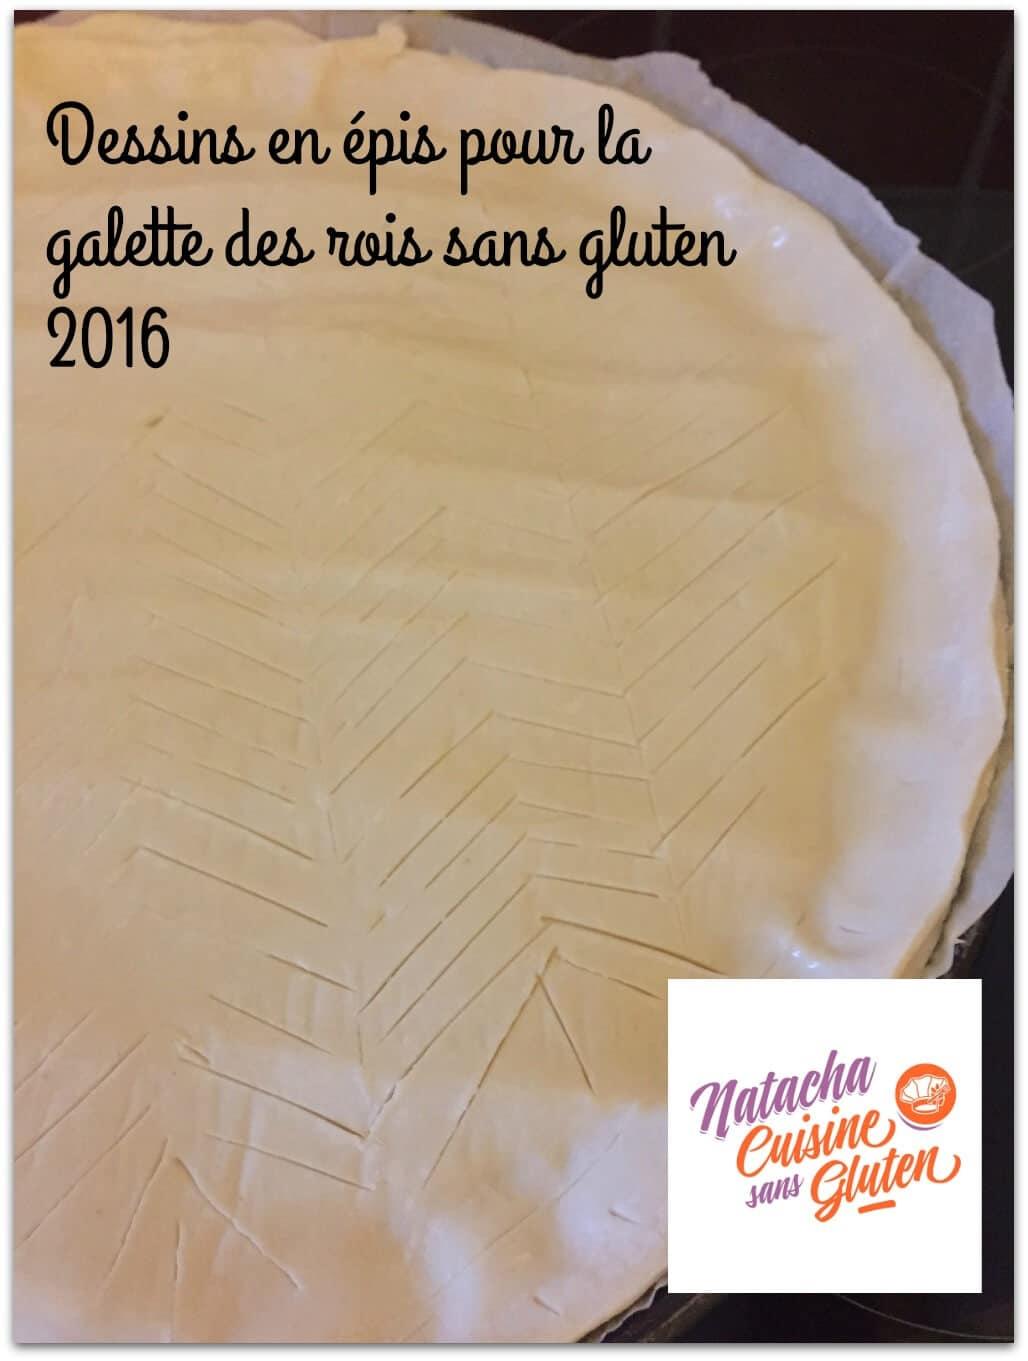 galette-roi-sans-gluten-frangipane-legere